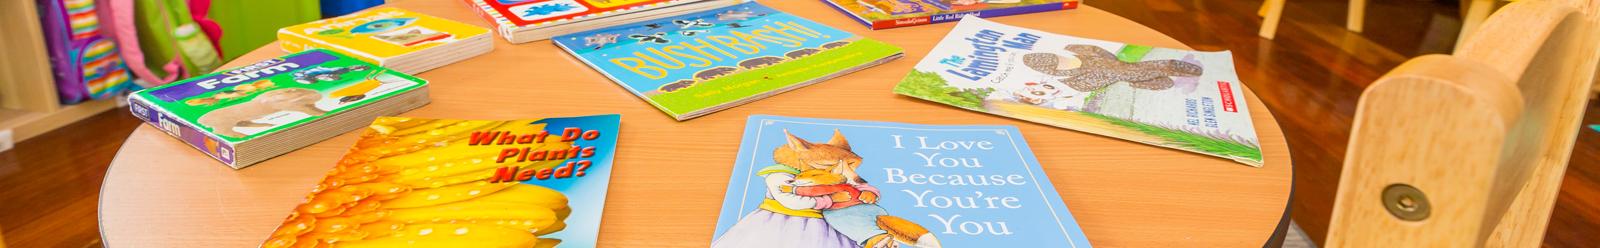 Buttercups Childcare and Kindergarten in Perth WA